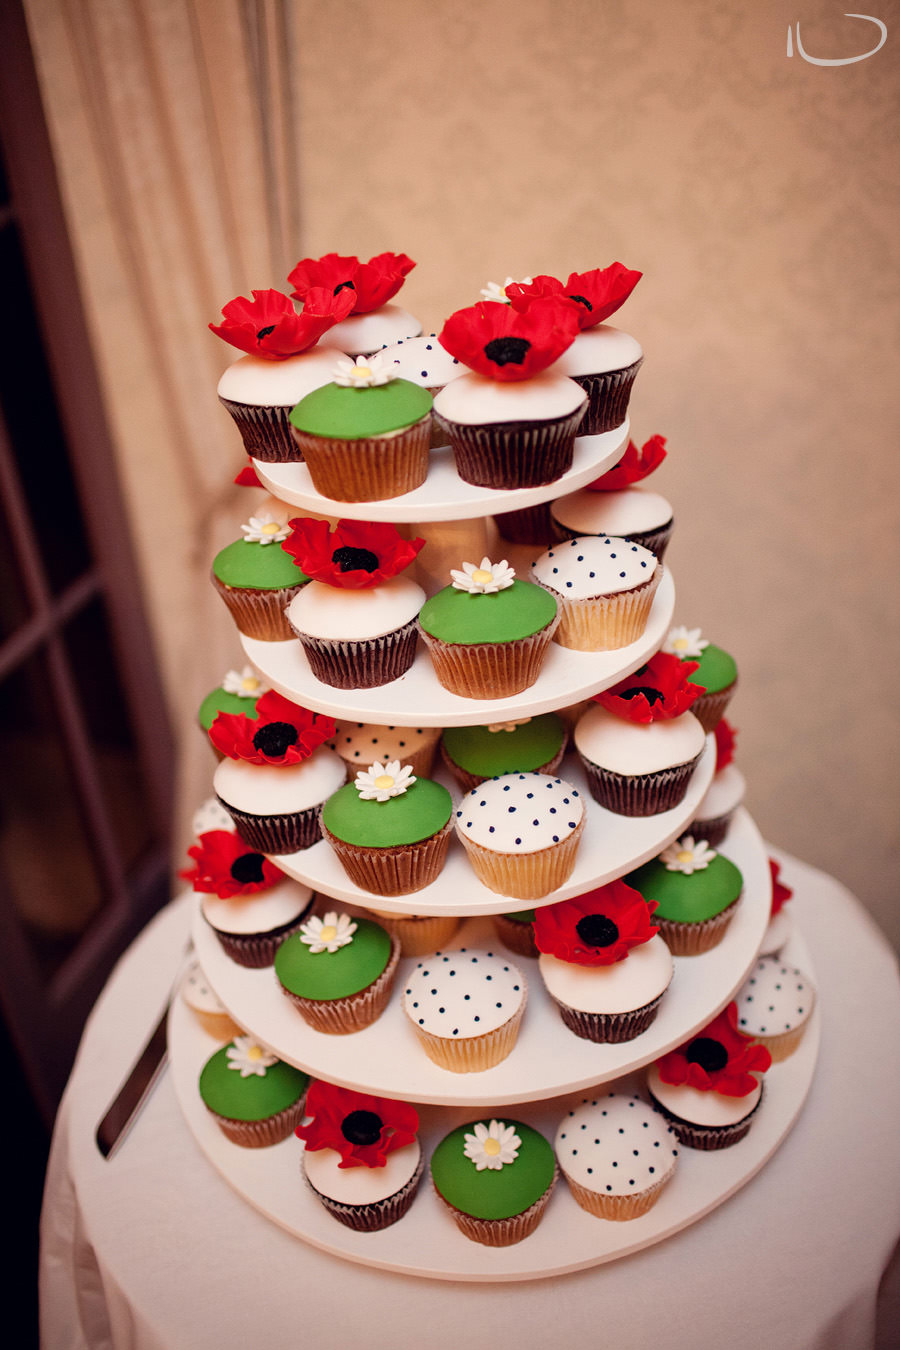 Gunners Barracks Wedding Photographer: Cupcake wedding cake